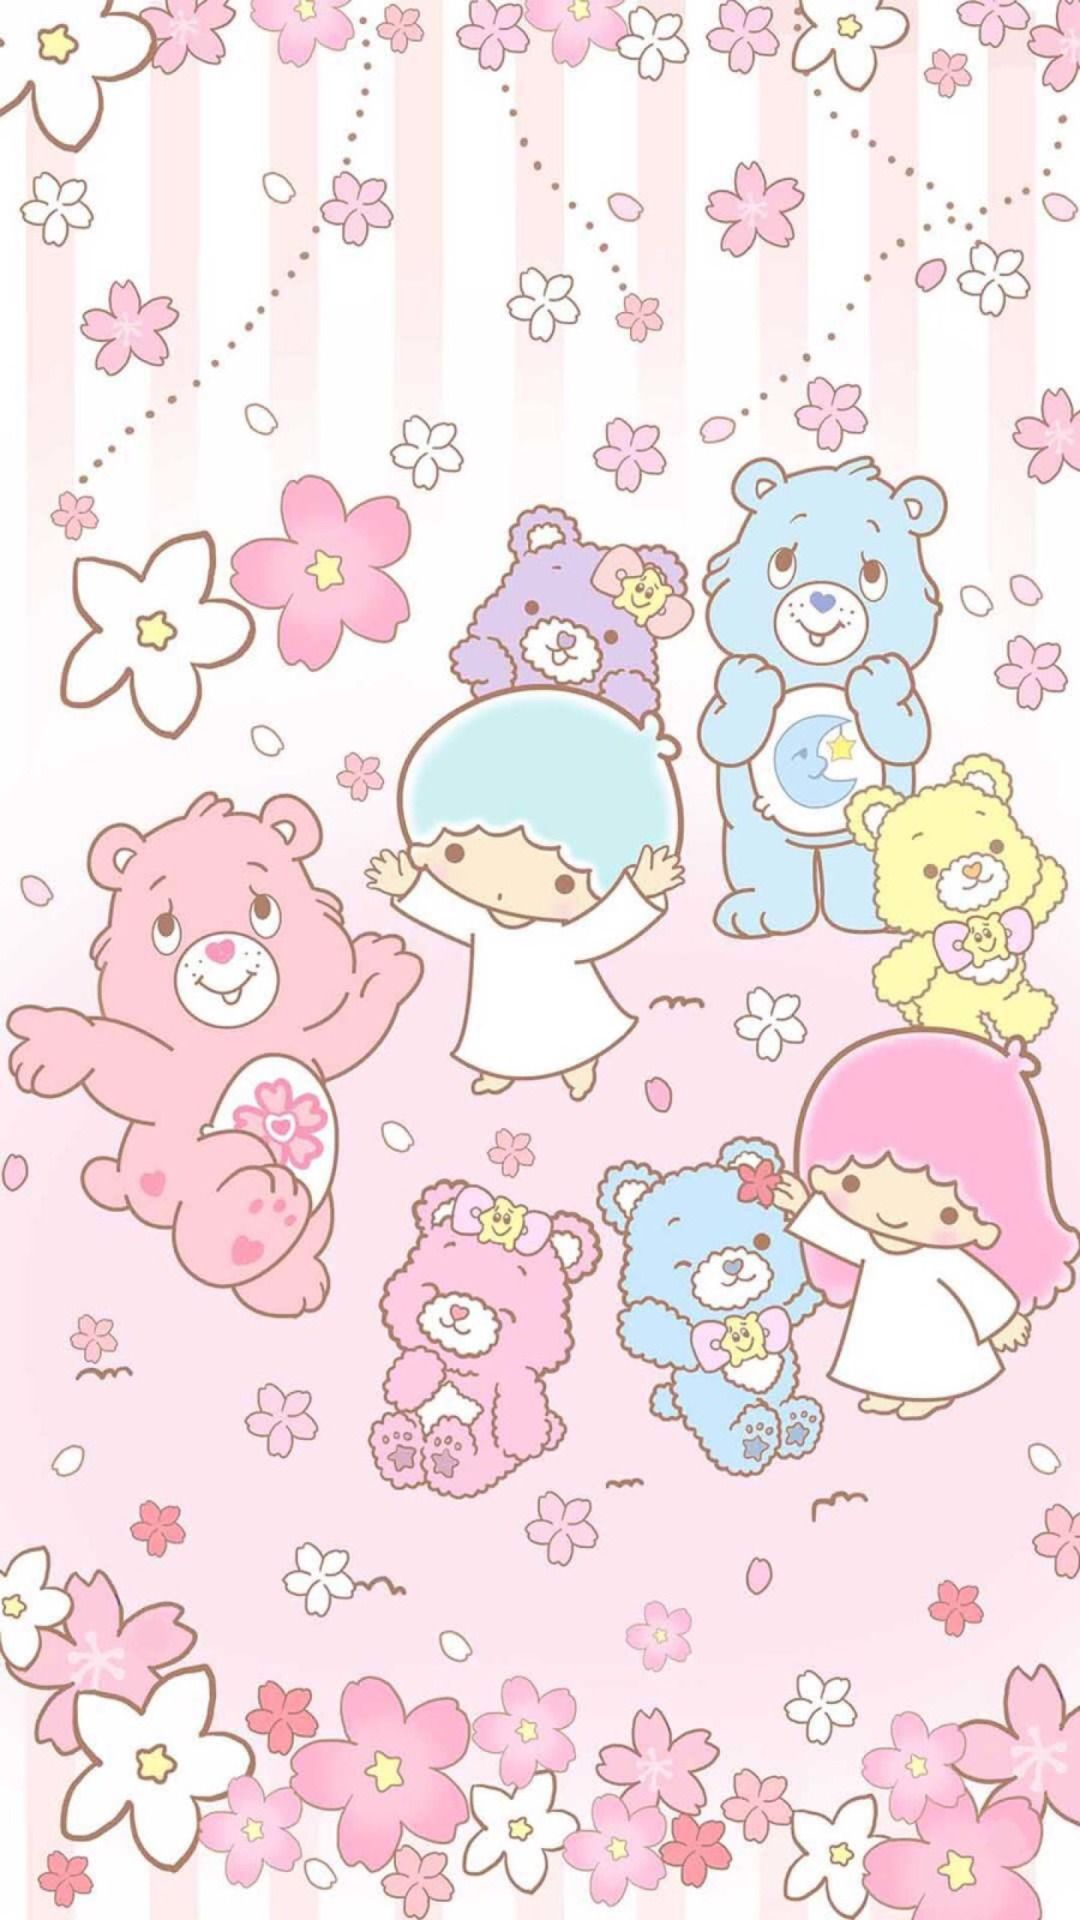 Download Wallpaper Hello Kitty Bear - 7d7e5b74856750b4ba7353537ca57194  Picture_629793.jpg